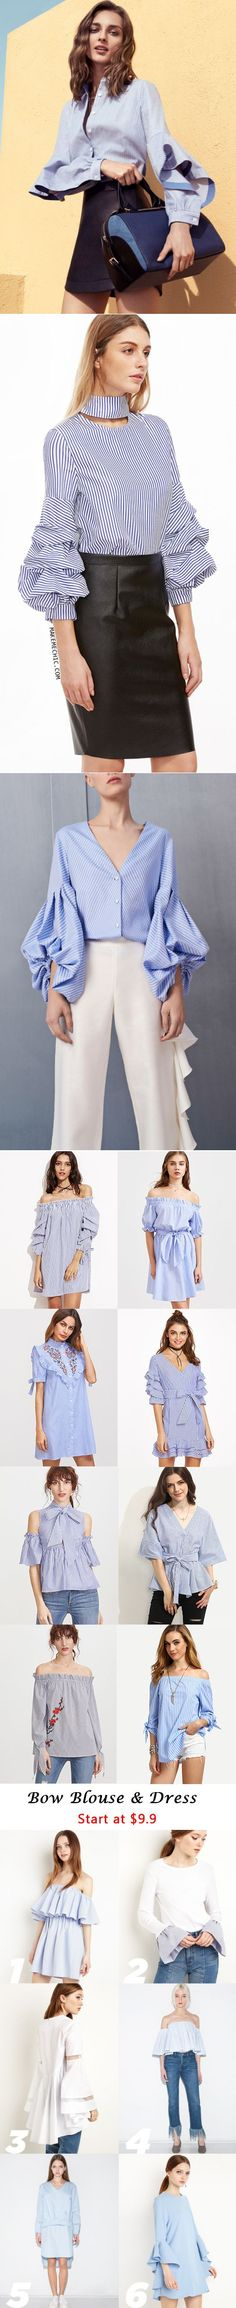 Блузки - рубашки: идеи / Тенденции / ВТОРАЯ УЛИЦА